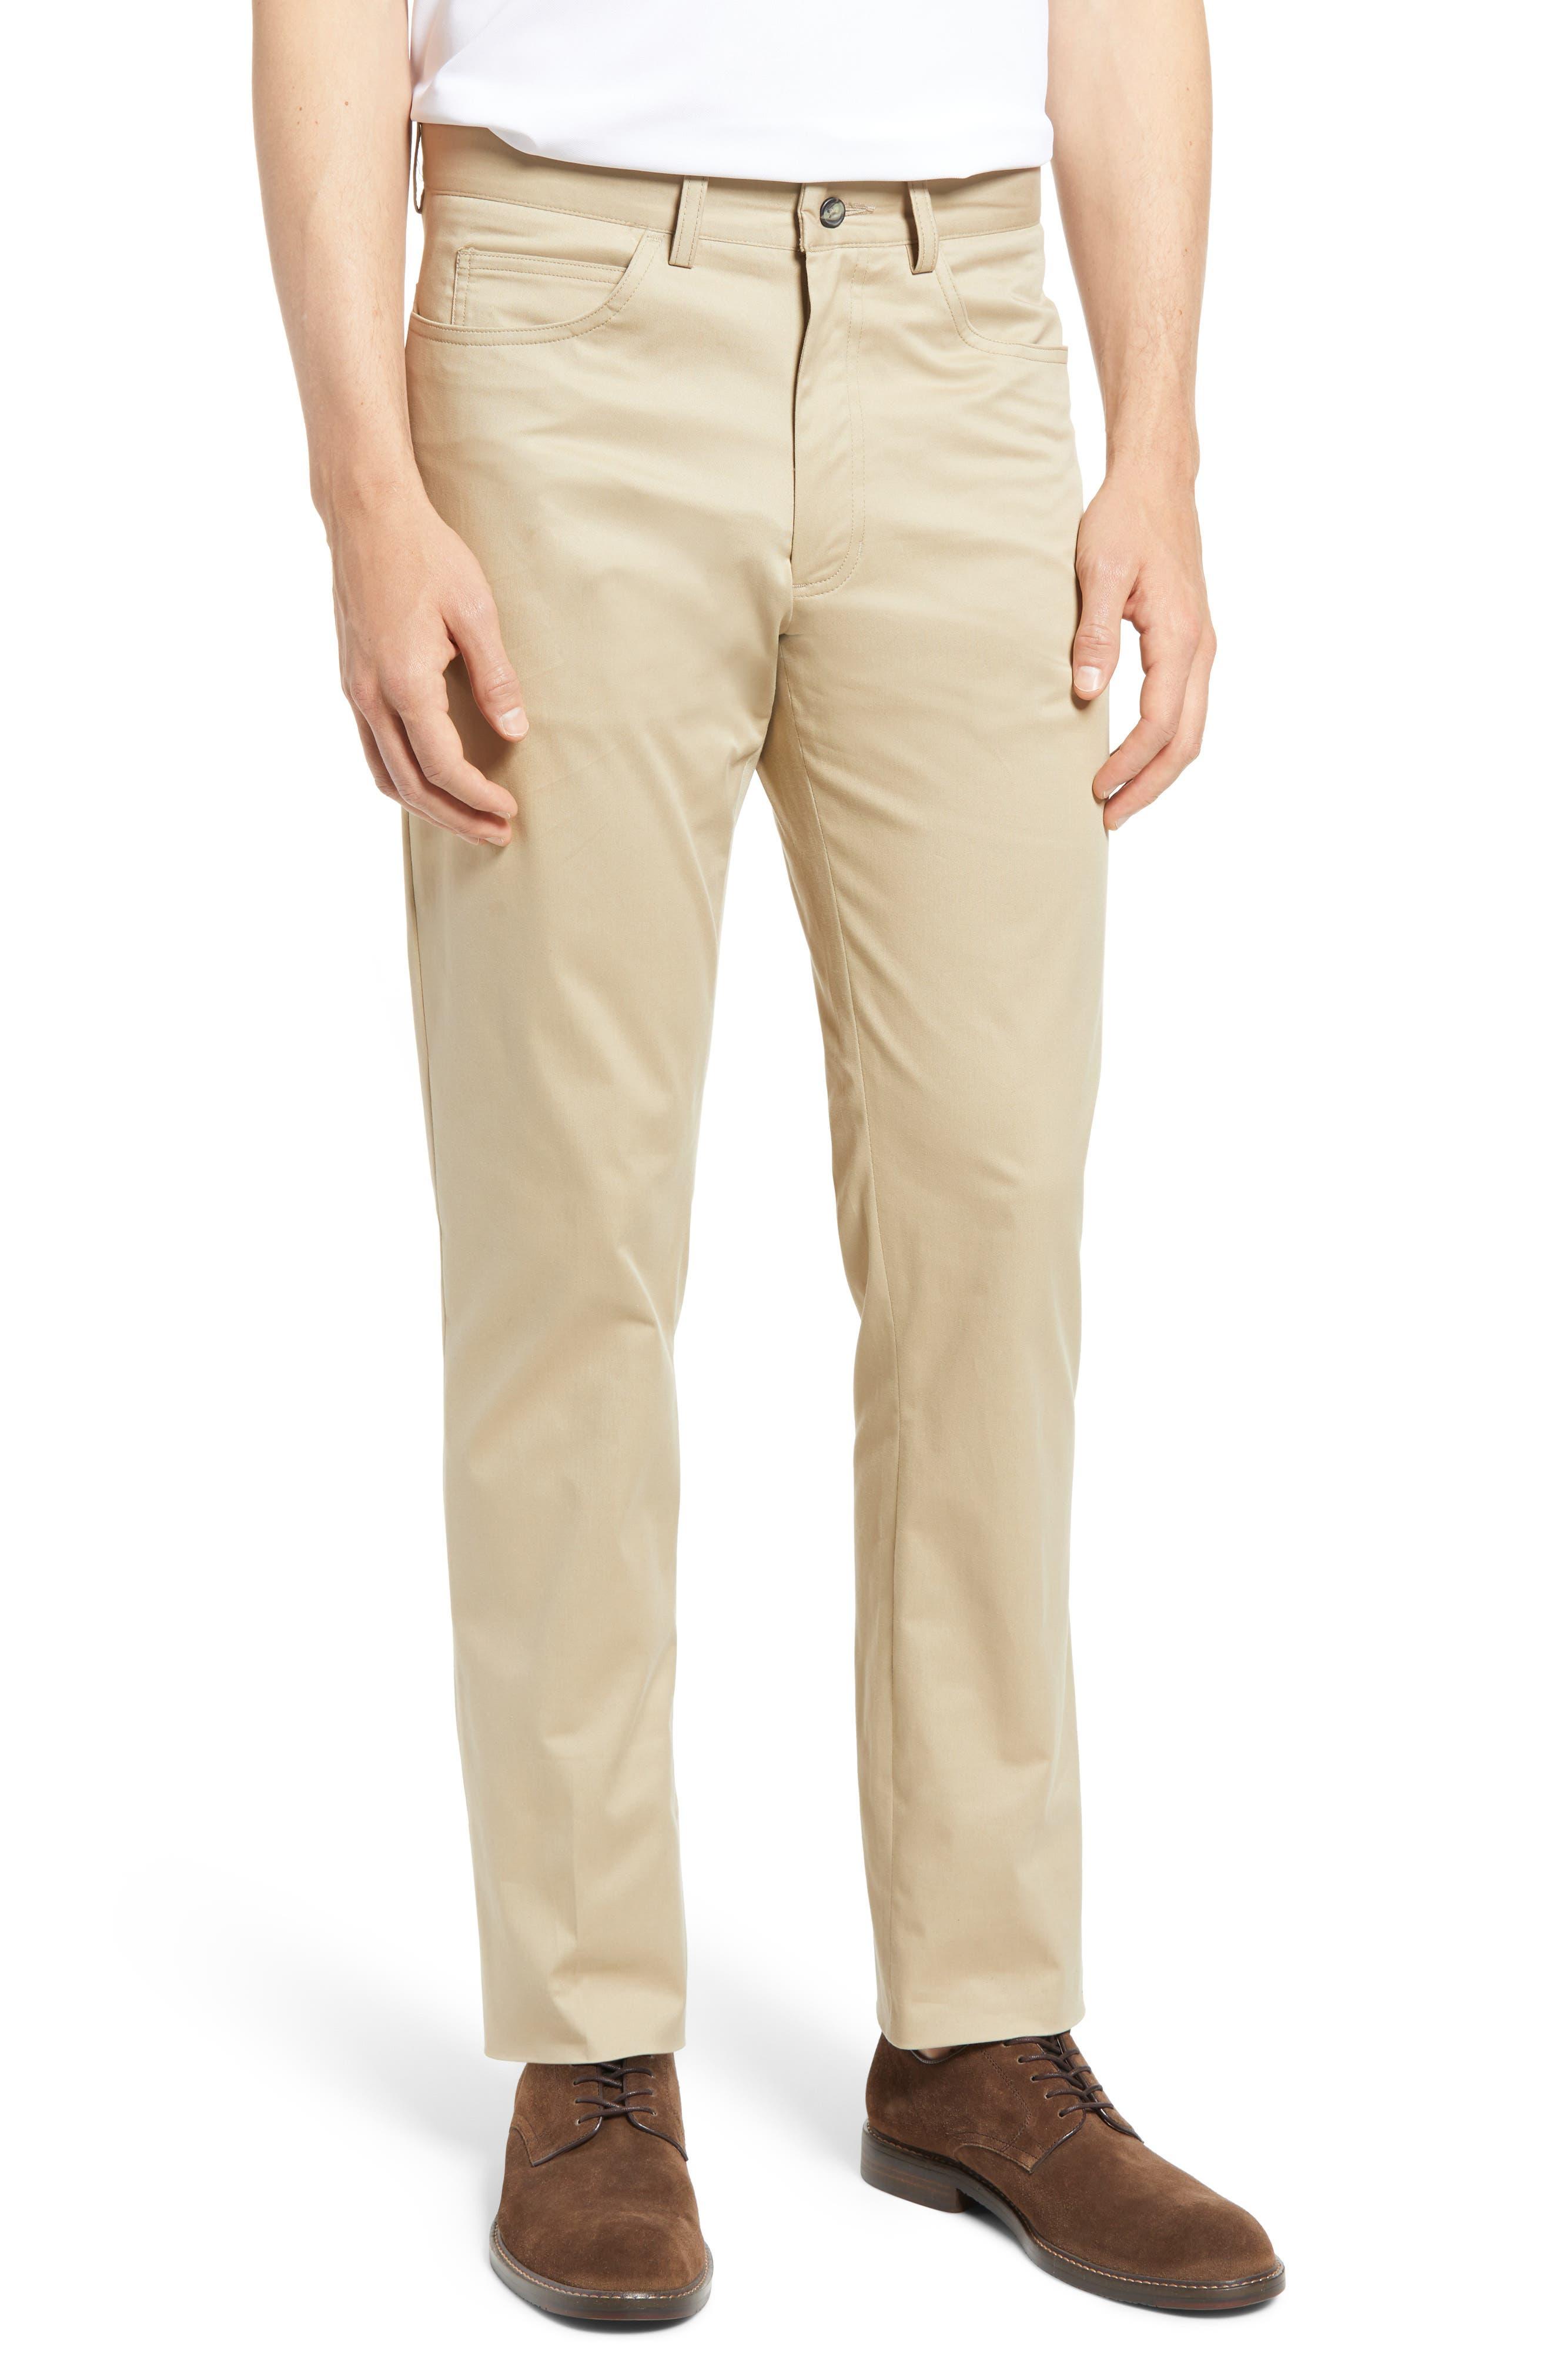 Charleston Flat Front Stretch Cotton Dress Pants